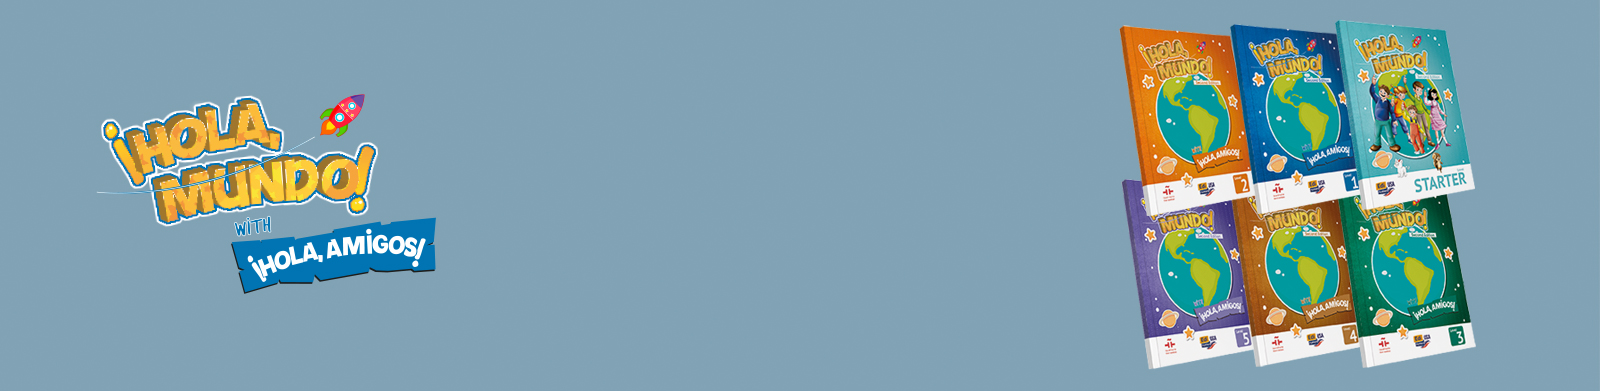 slide_2_2_blue